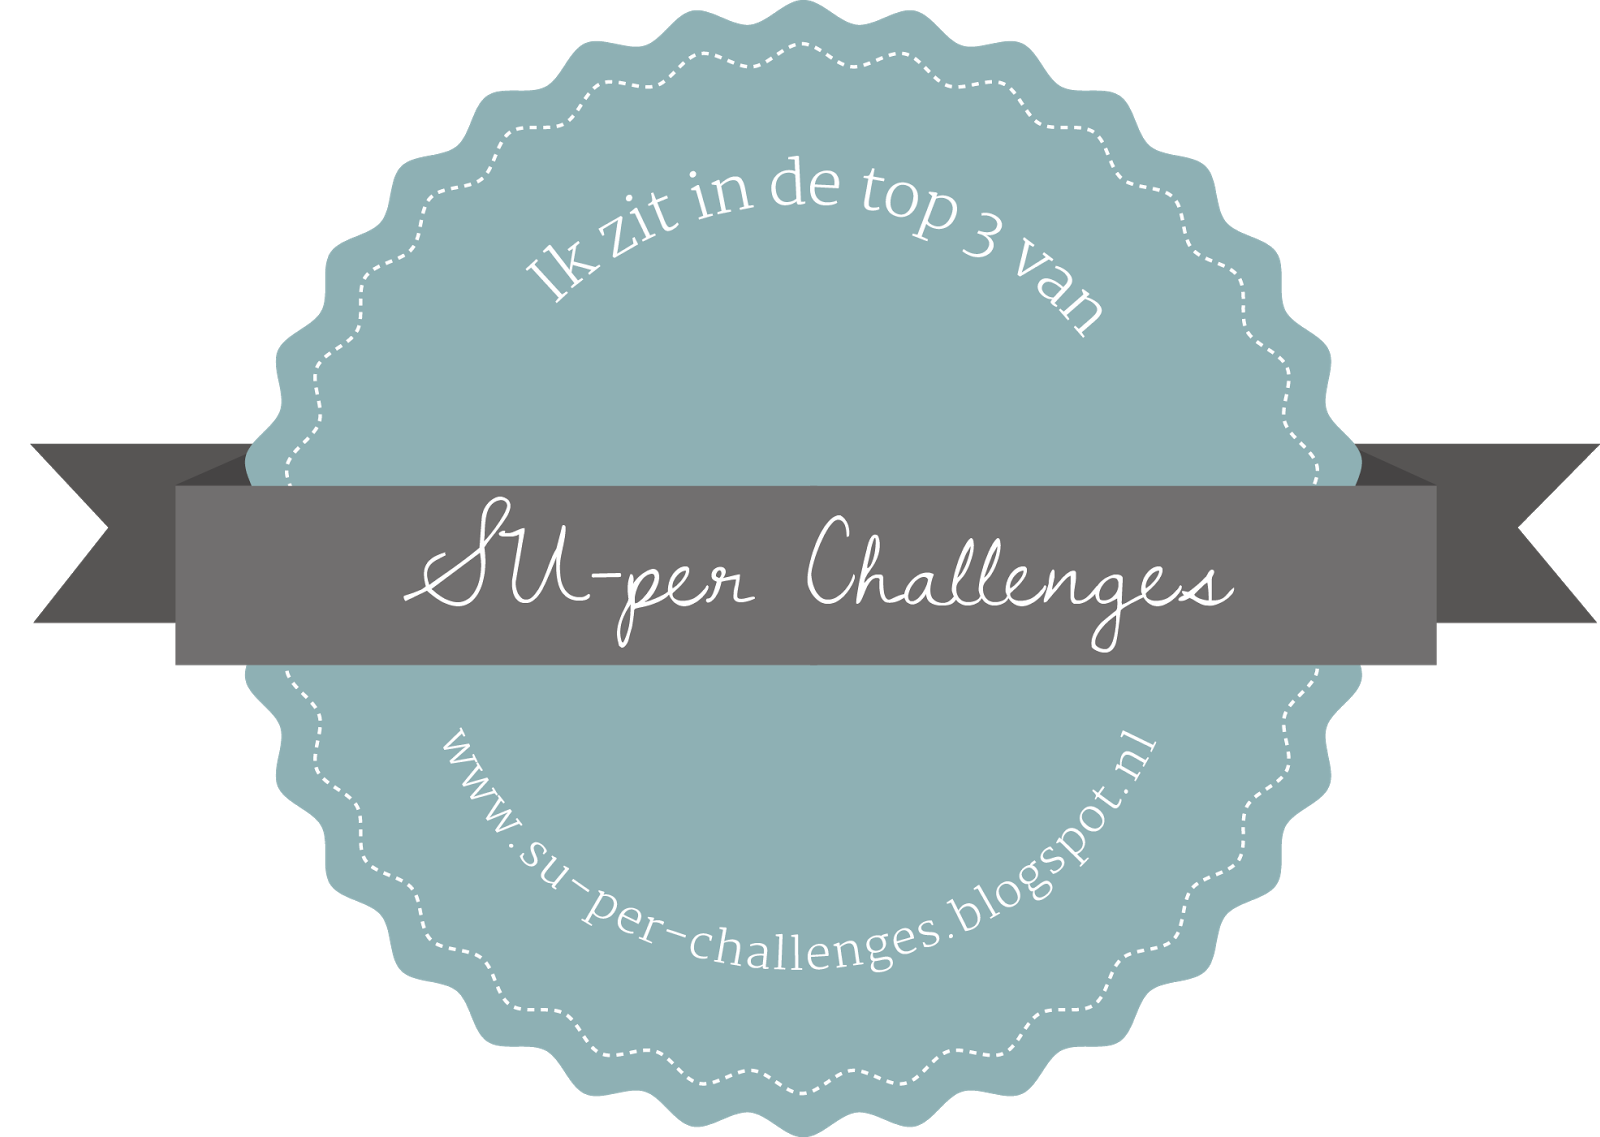 SU-per challenges blogspot